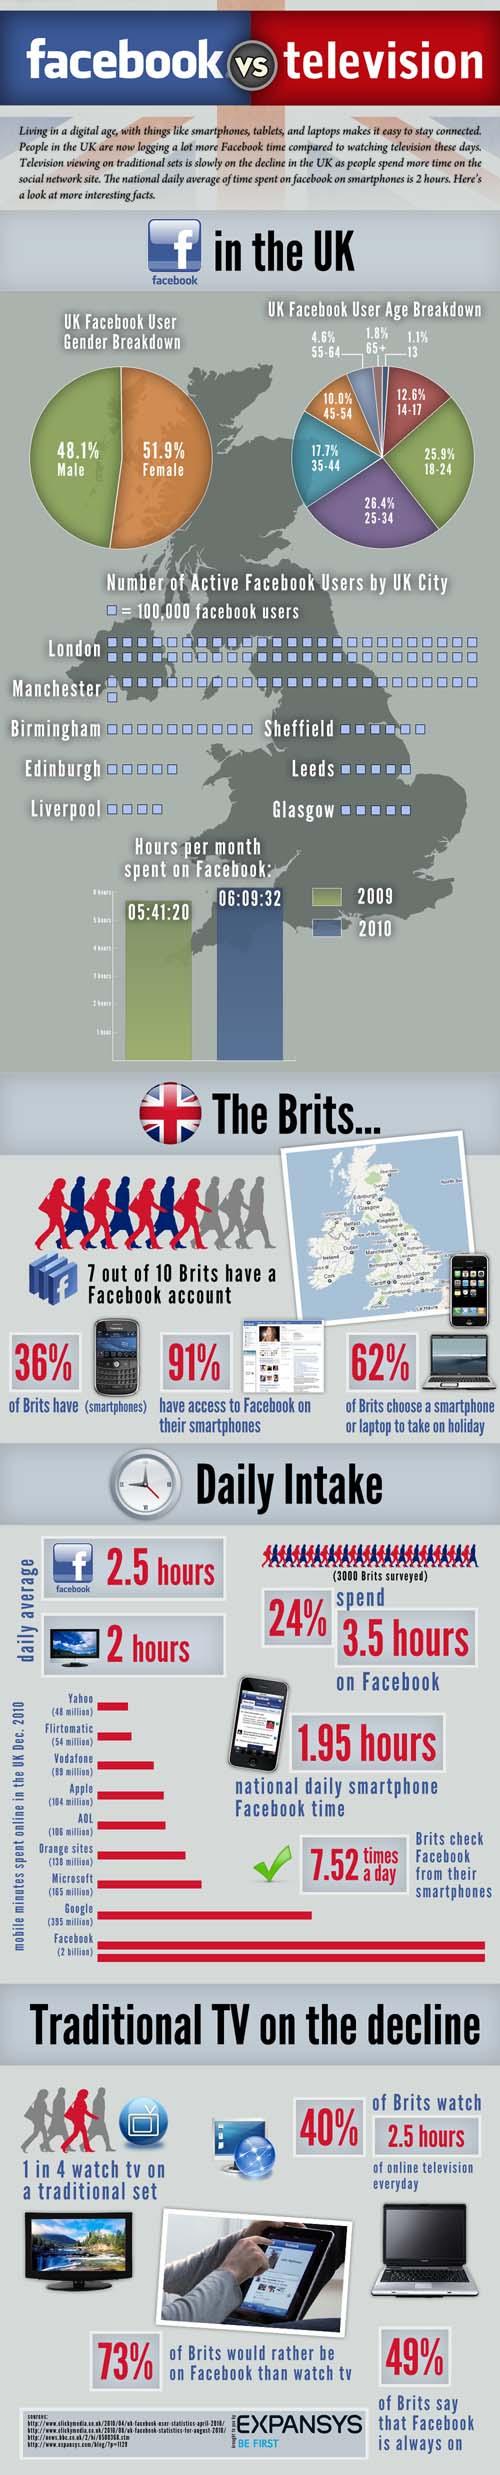 Facebook vs. TV